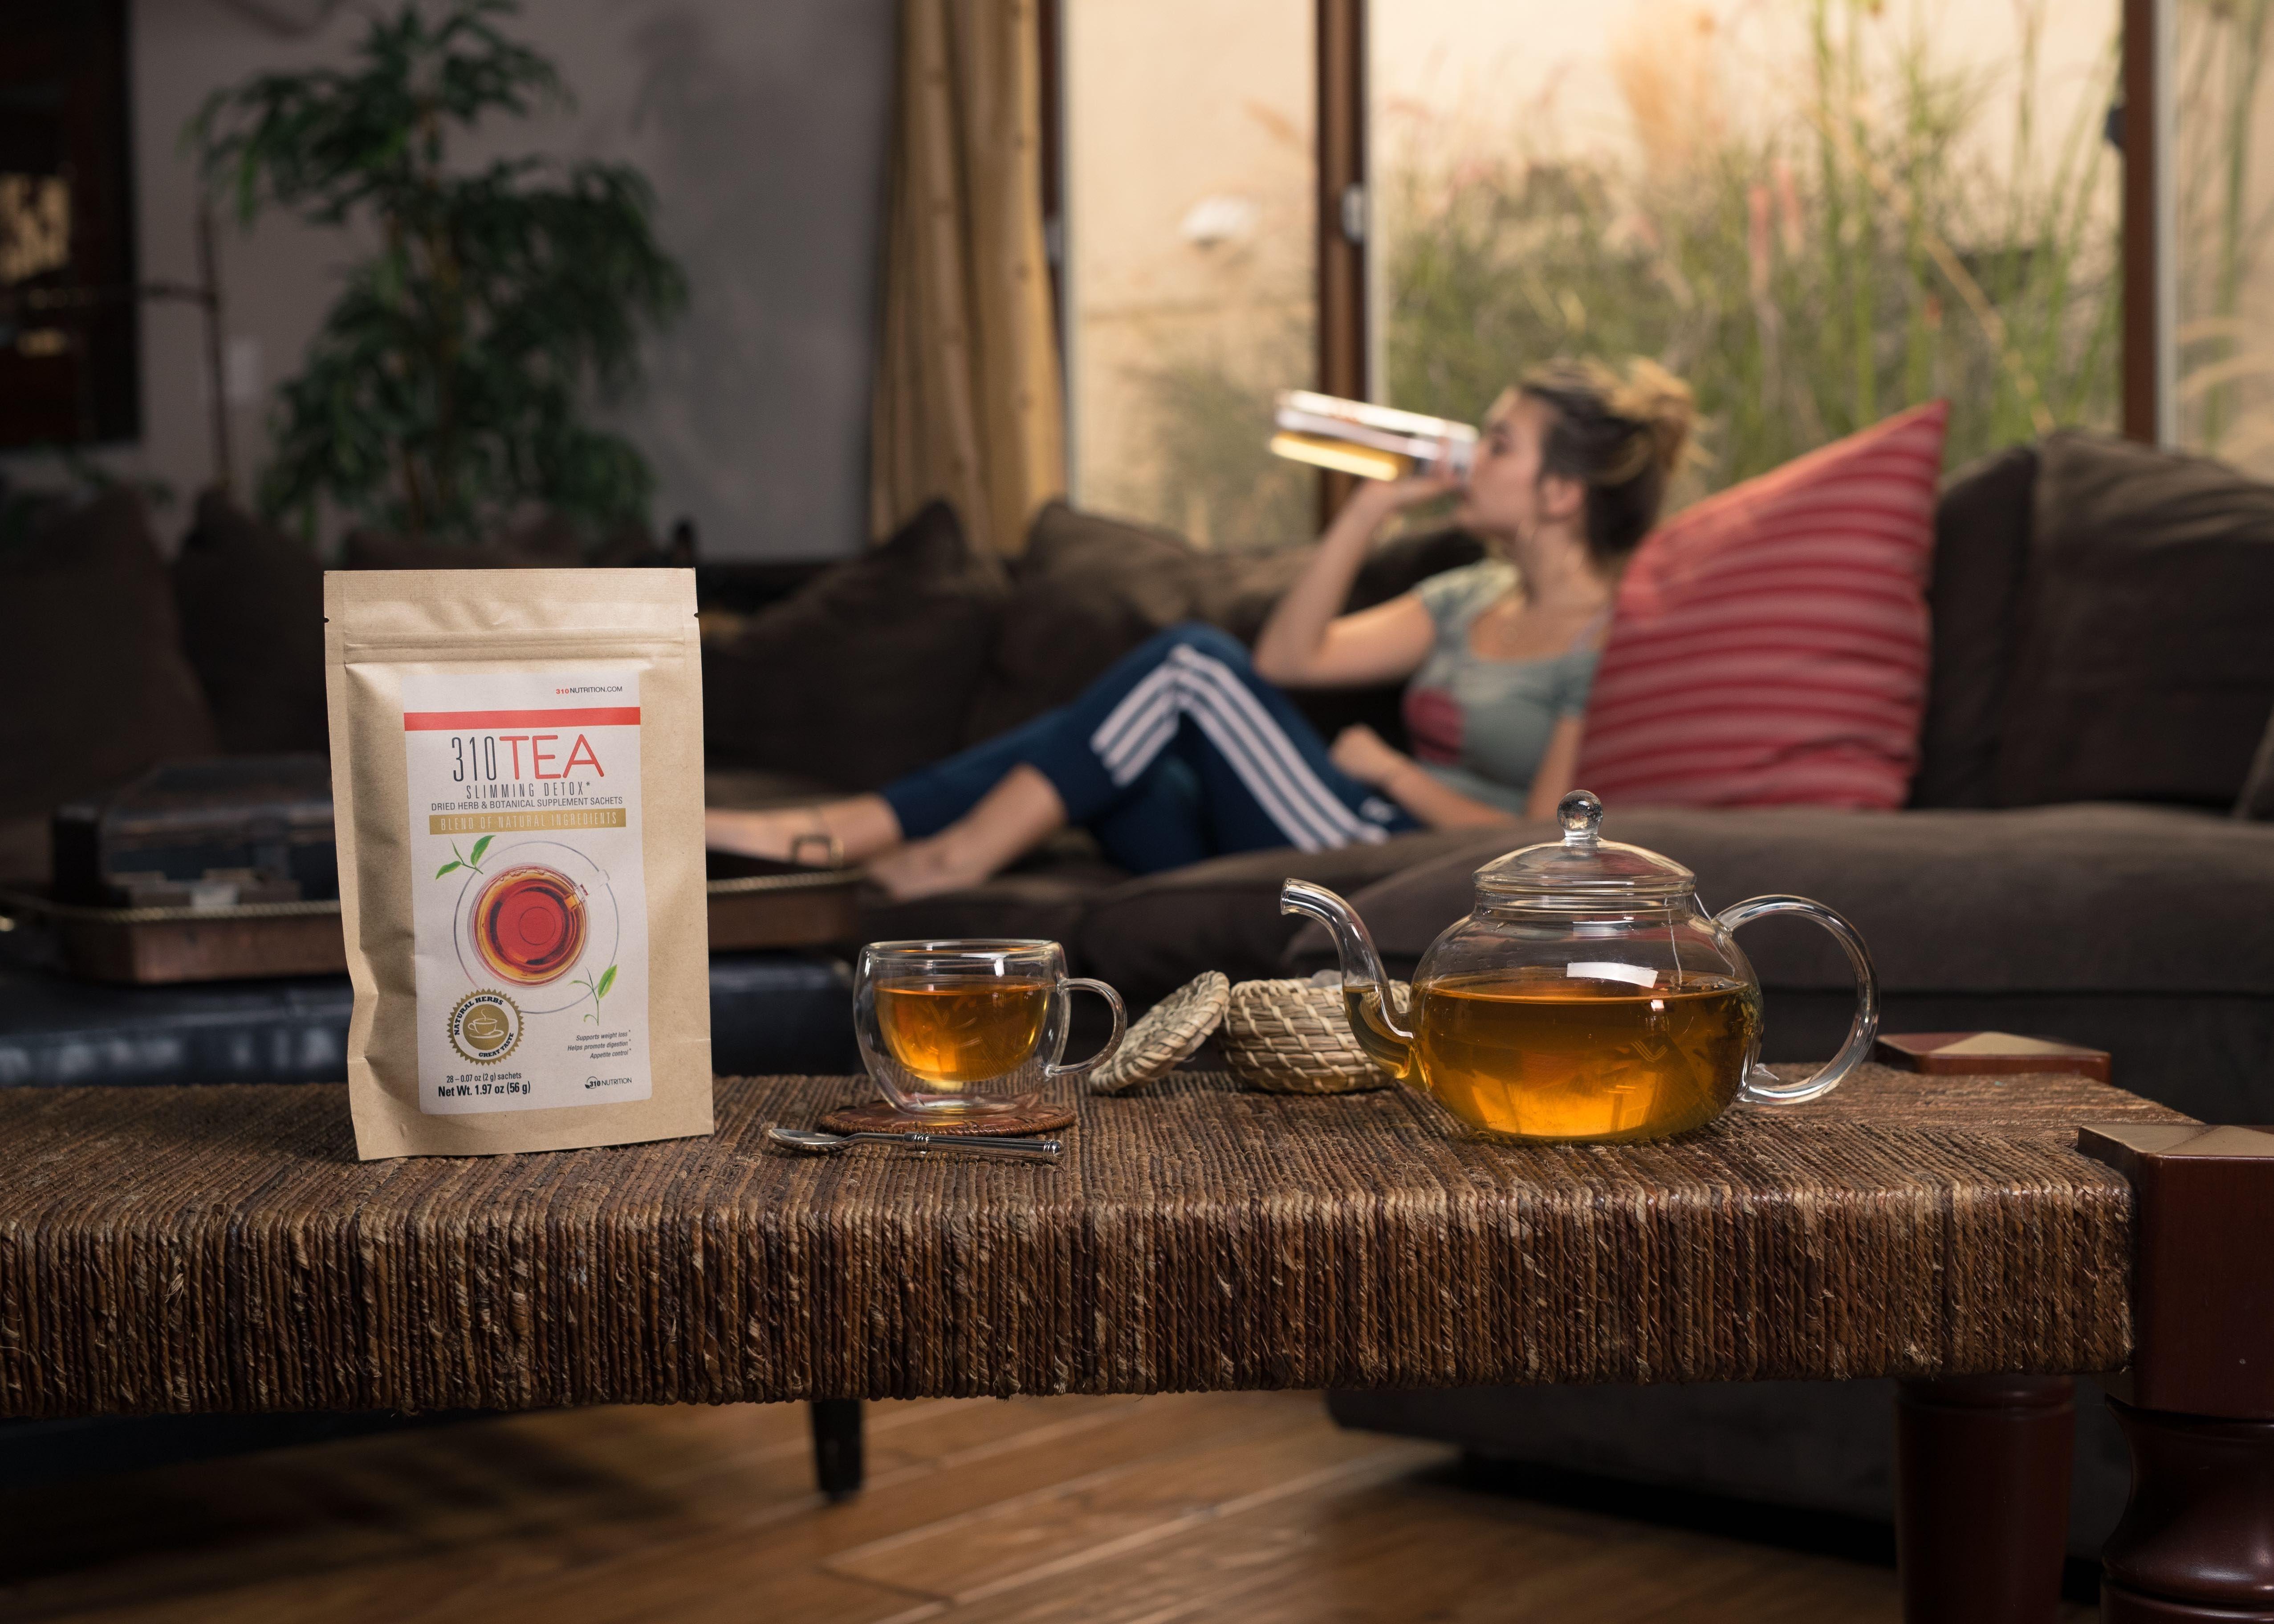 310 teas 310 nutrition flat tummy tea detox your body